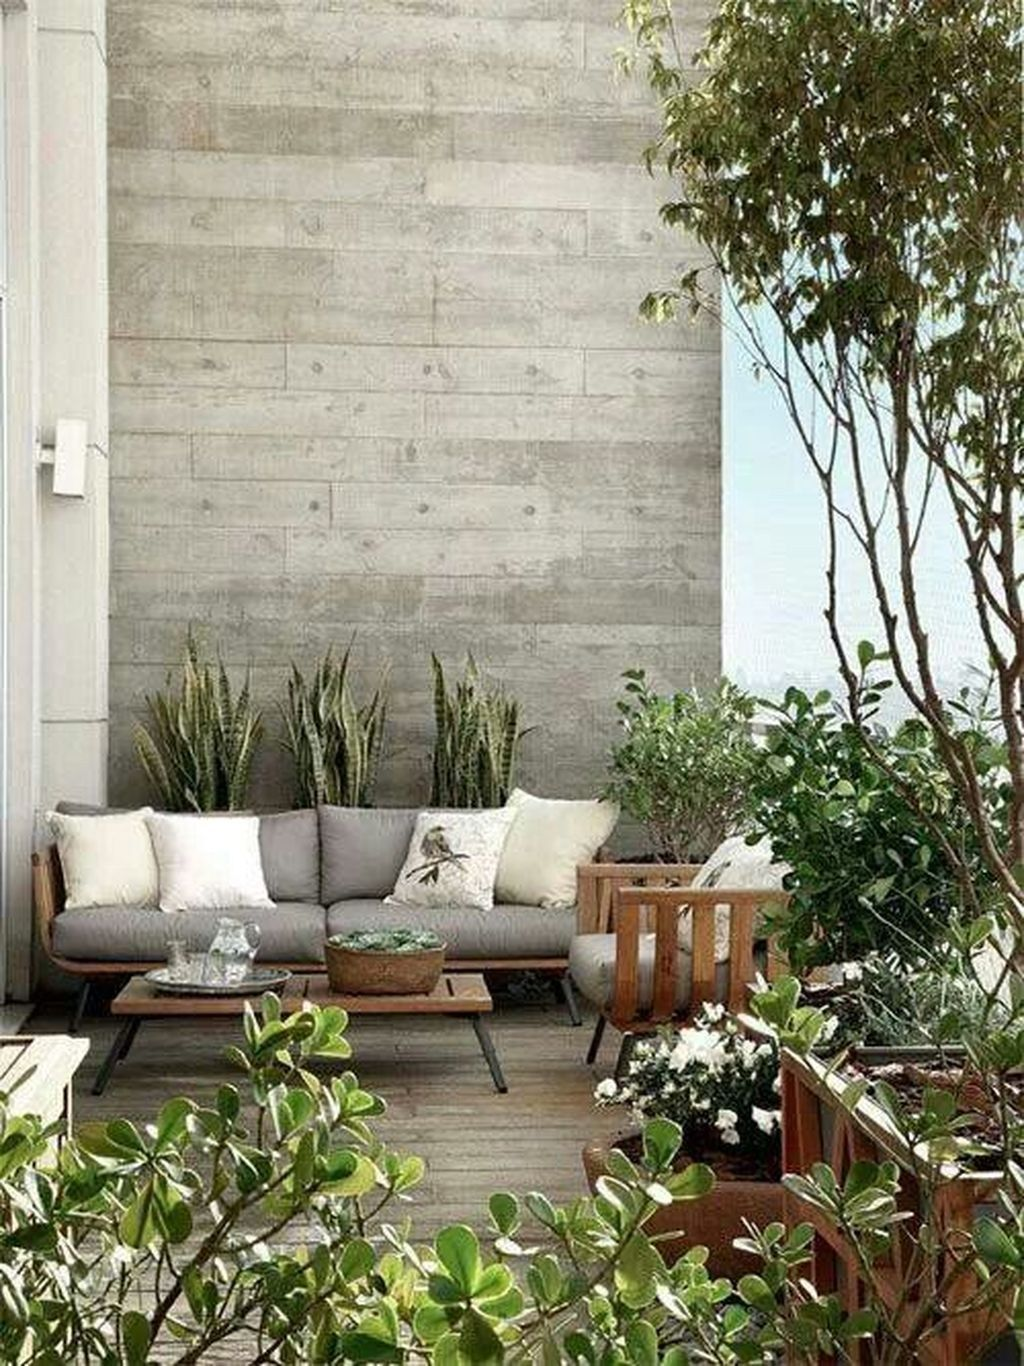 Awesome apartment balcony design ideas also florida house rh pinterest